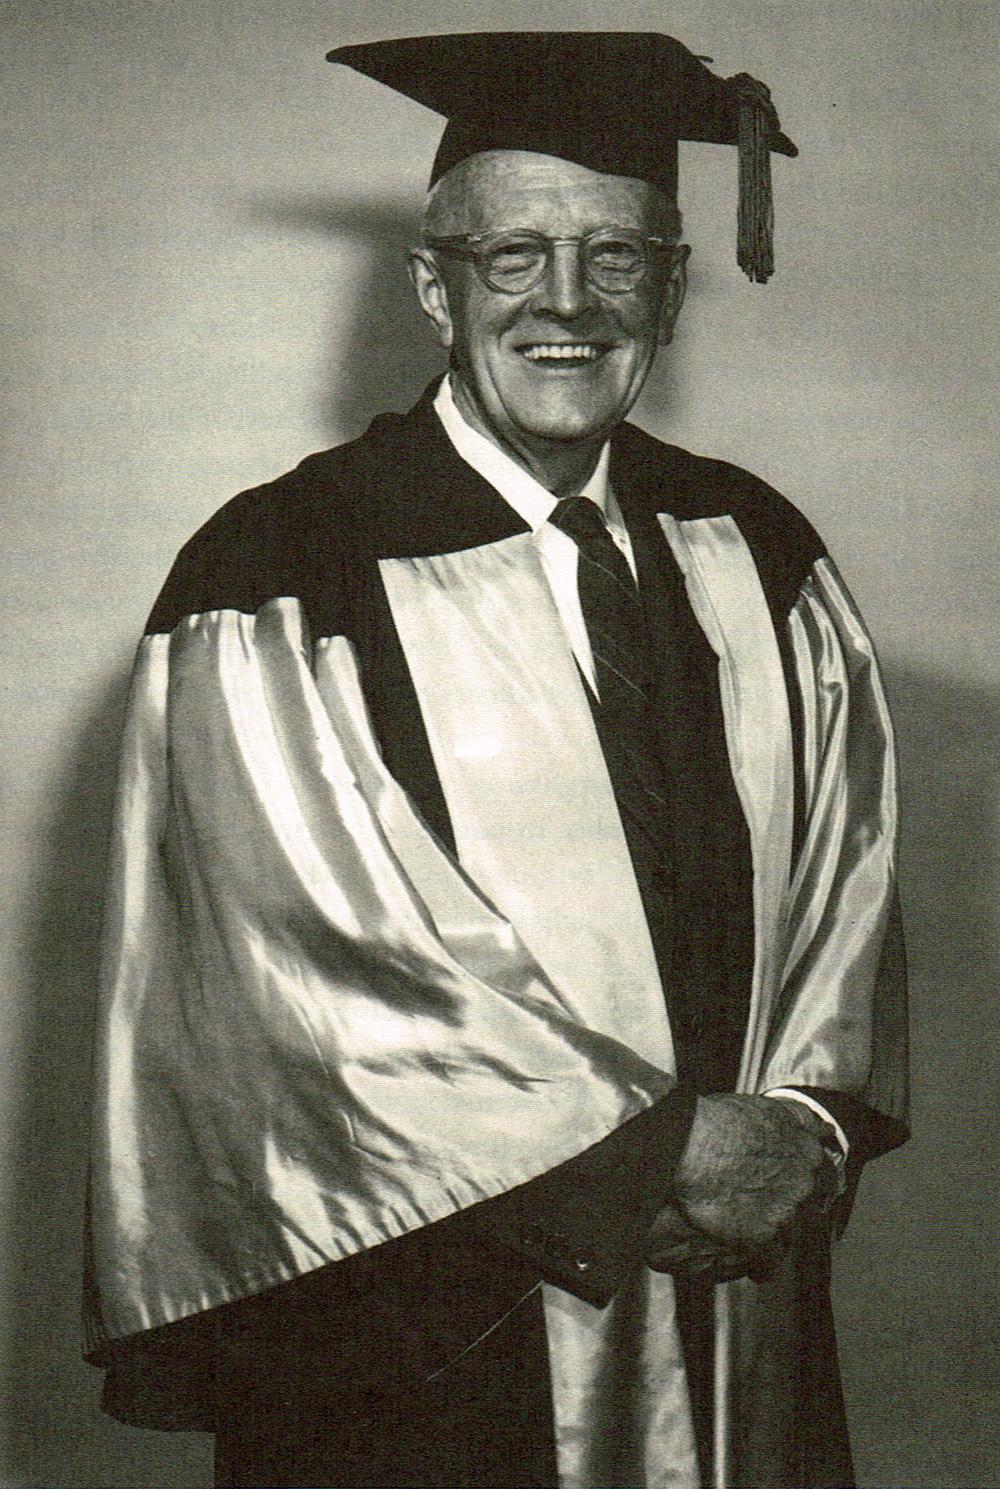 an archival photo of Frank Underhill, a U of T professor